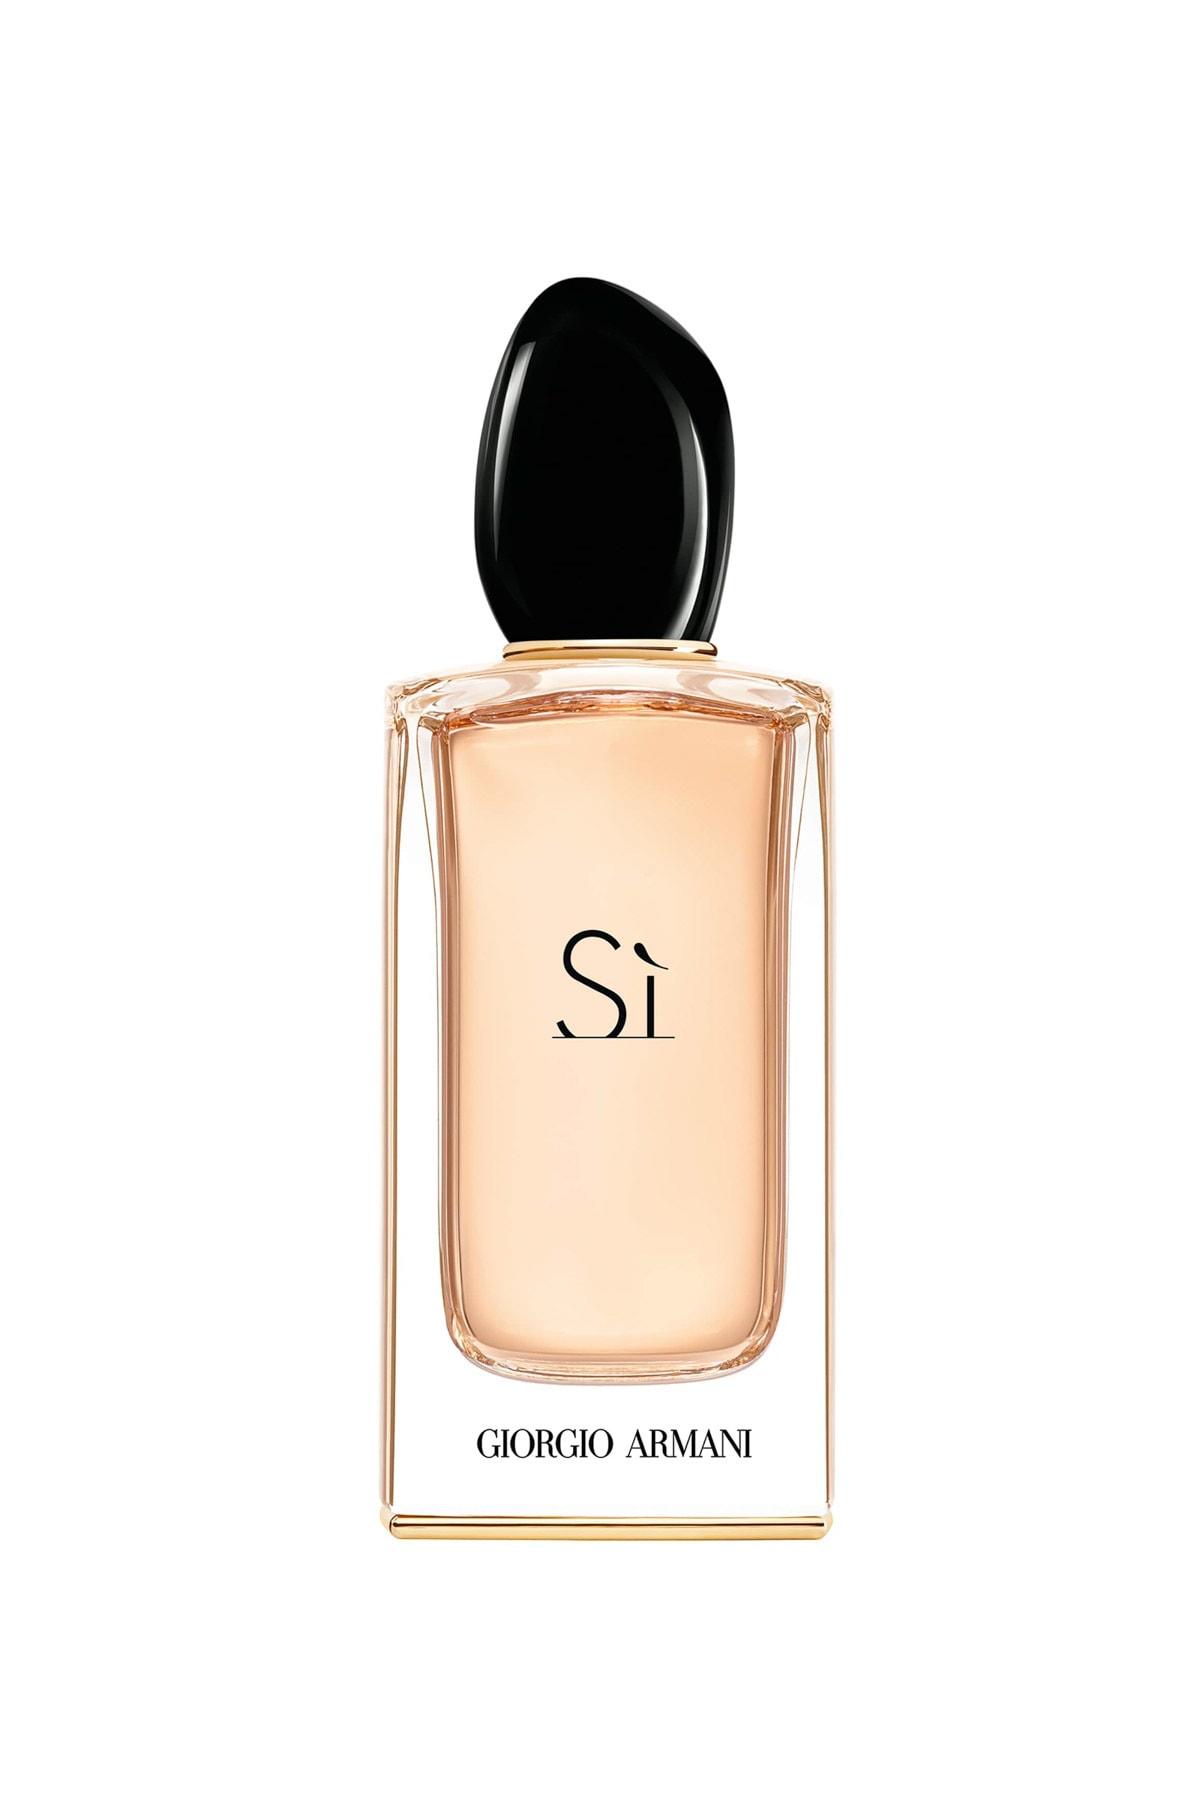 Giorgio Armani Si Kadin Eau De Parfum 100 ml 3605521816658 1